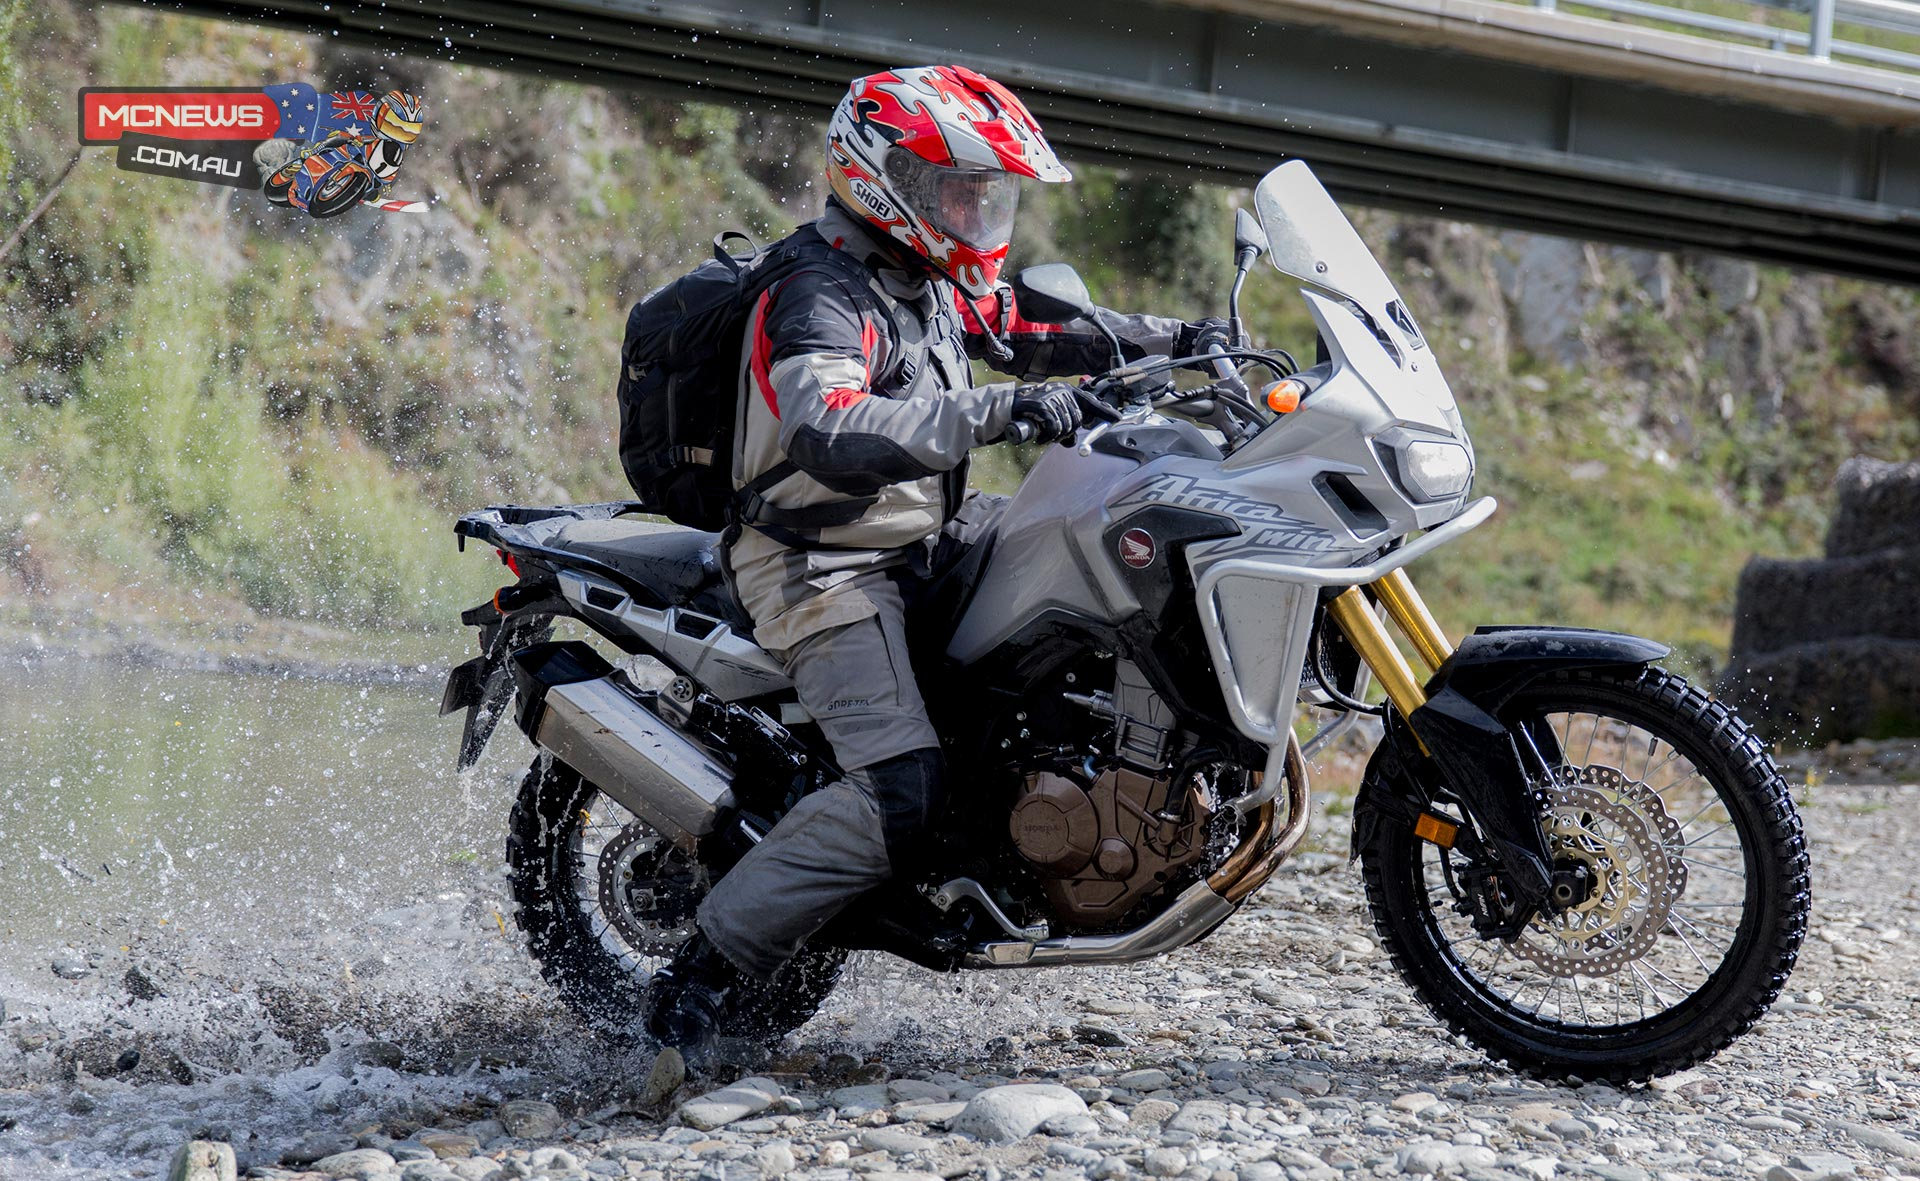 Honda Africa Twin - Daryl Beattie - Image by Harley Hamer